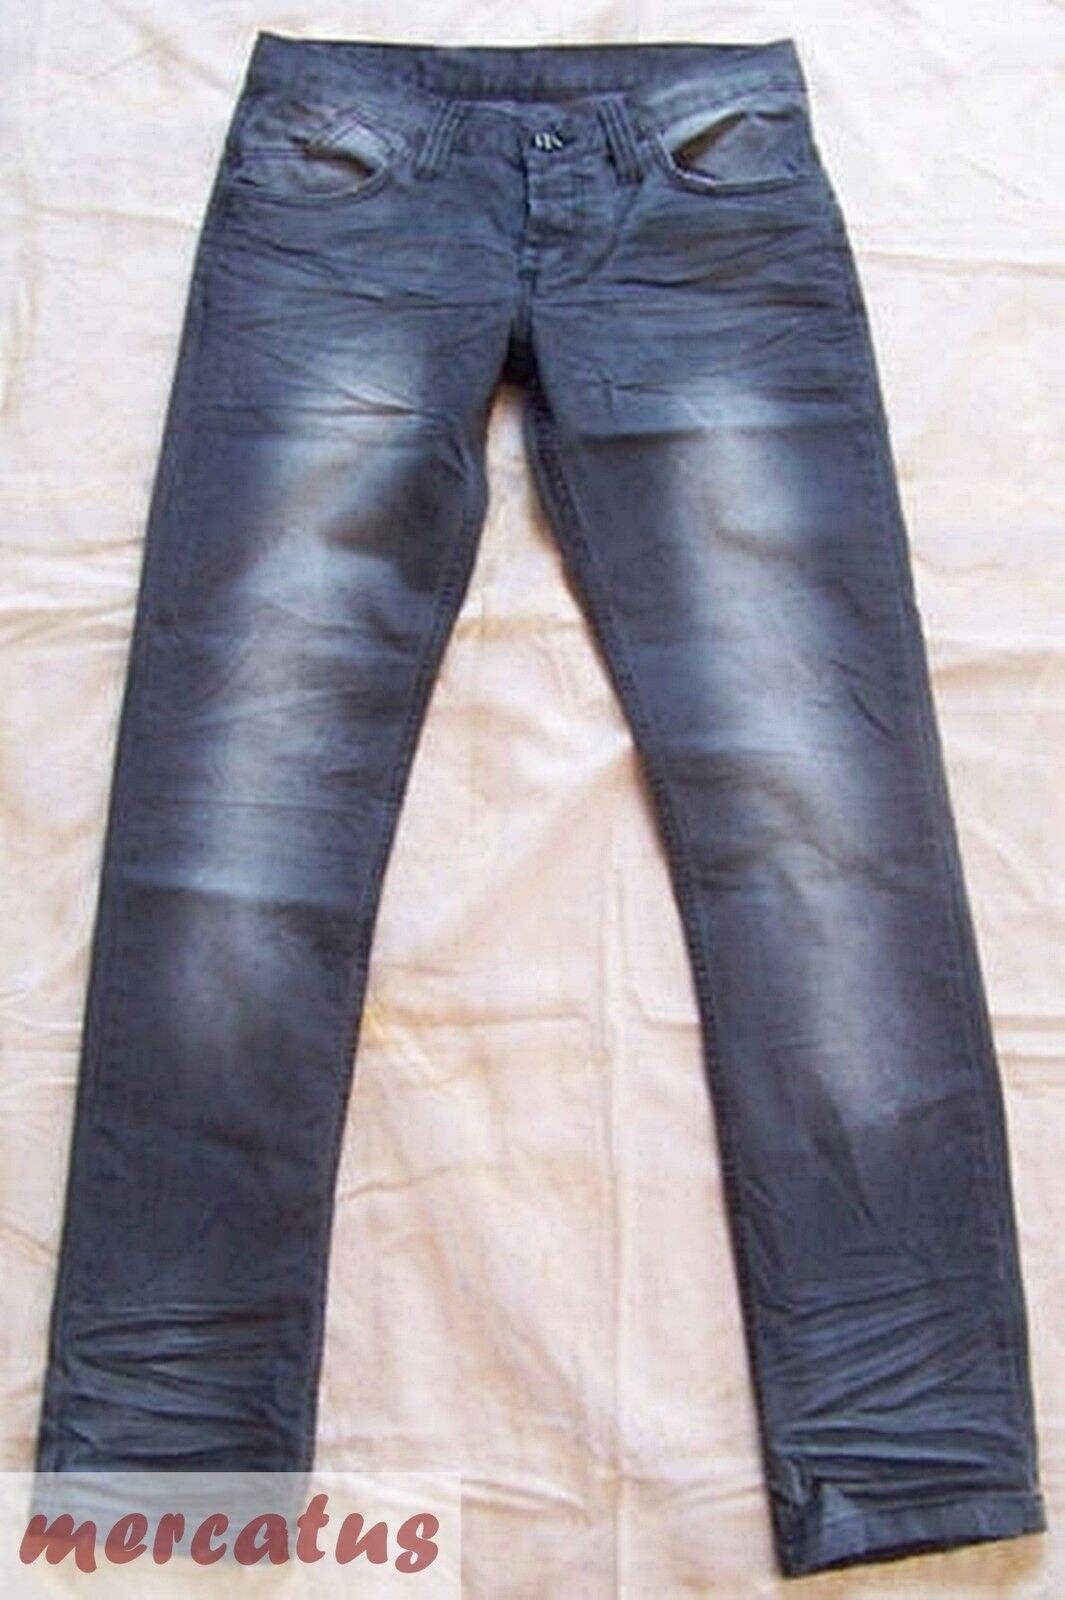 Modehit      Seltene Designer Jeans vom InLabel KINGZ  UVP  129,90